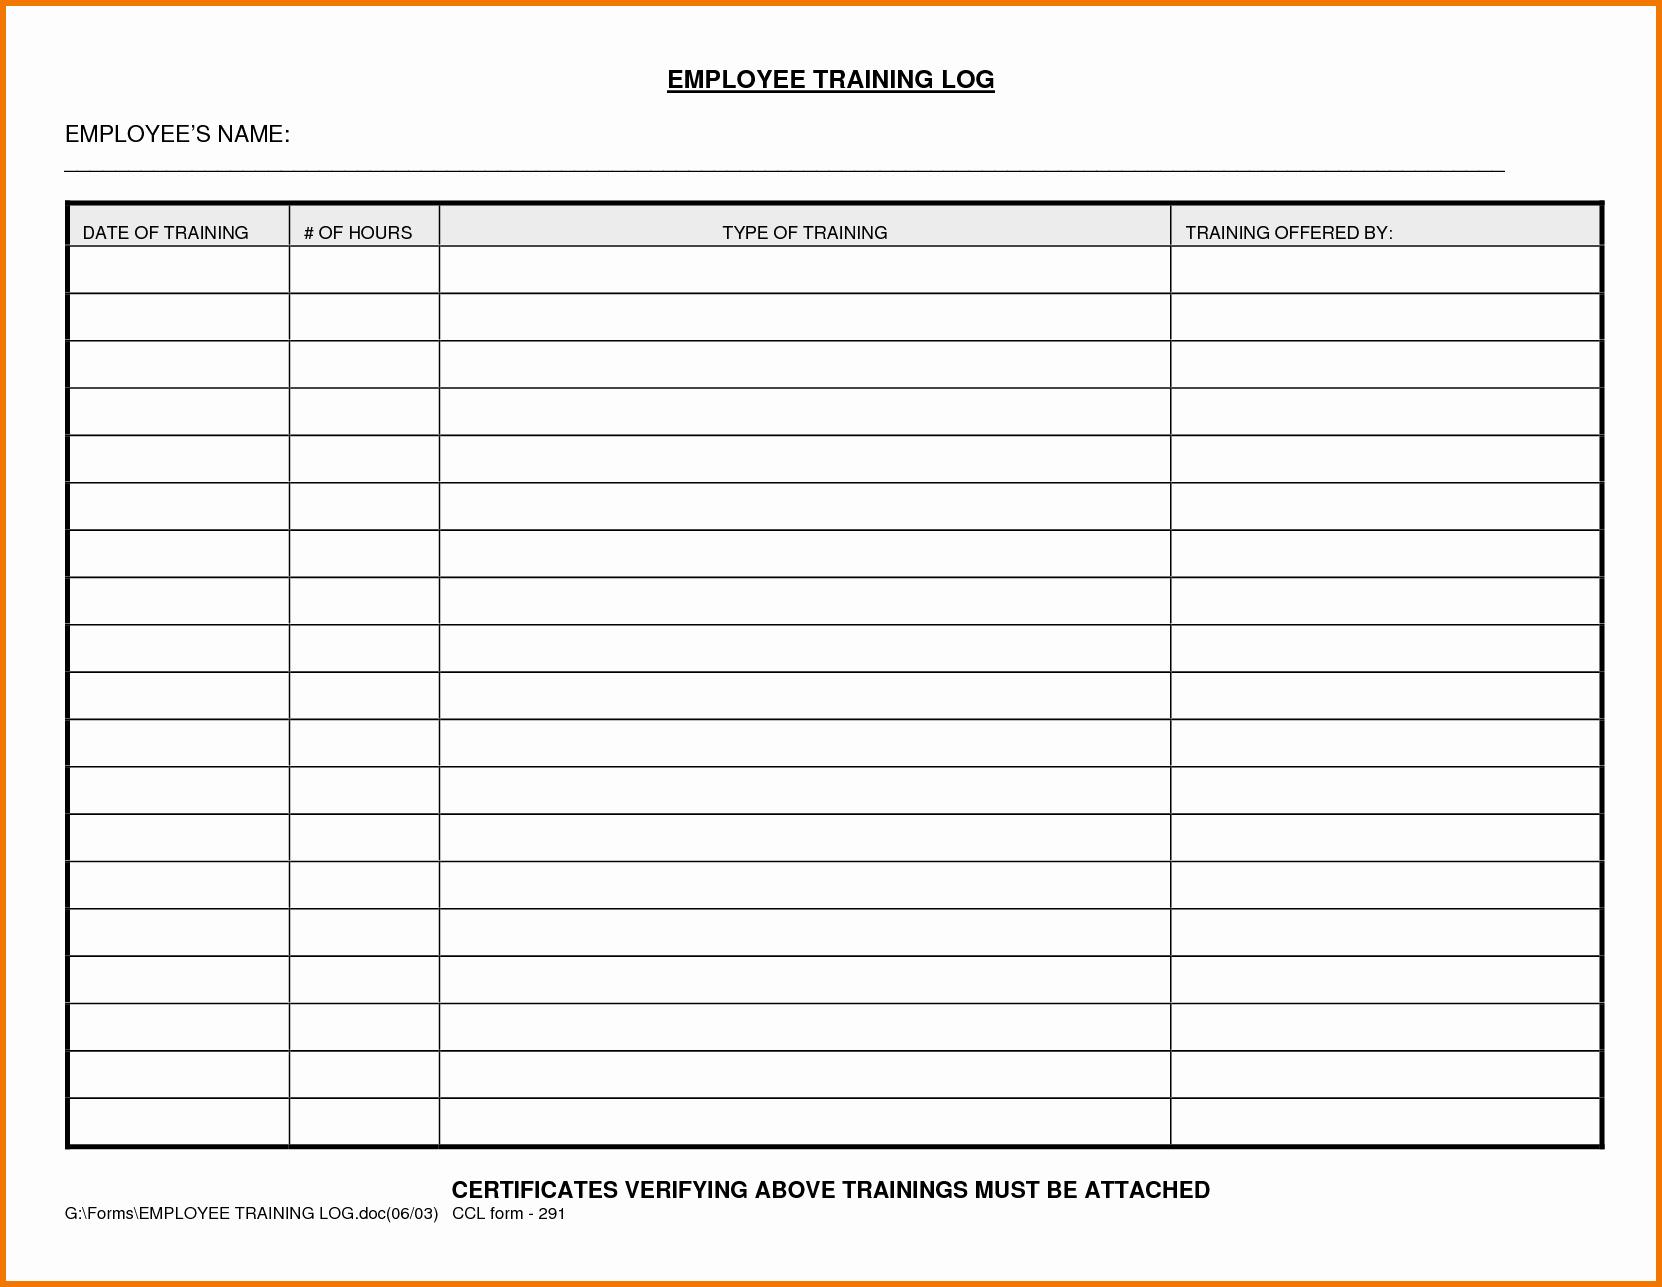 Training New Employees Template Beautiful Excel Employee Training Log Template Employee Training